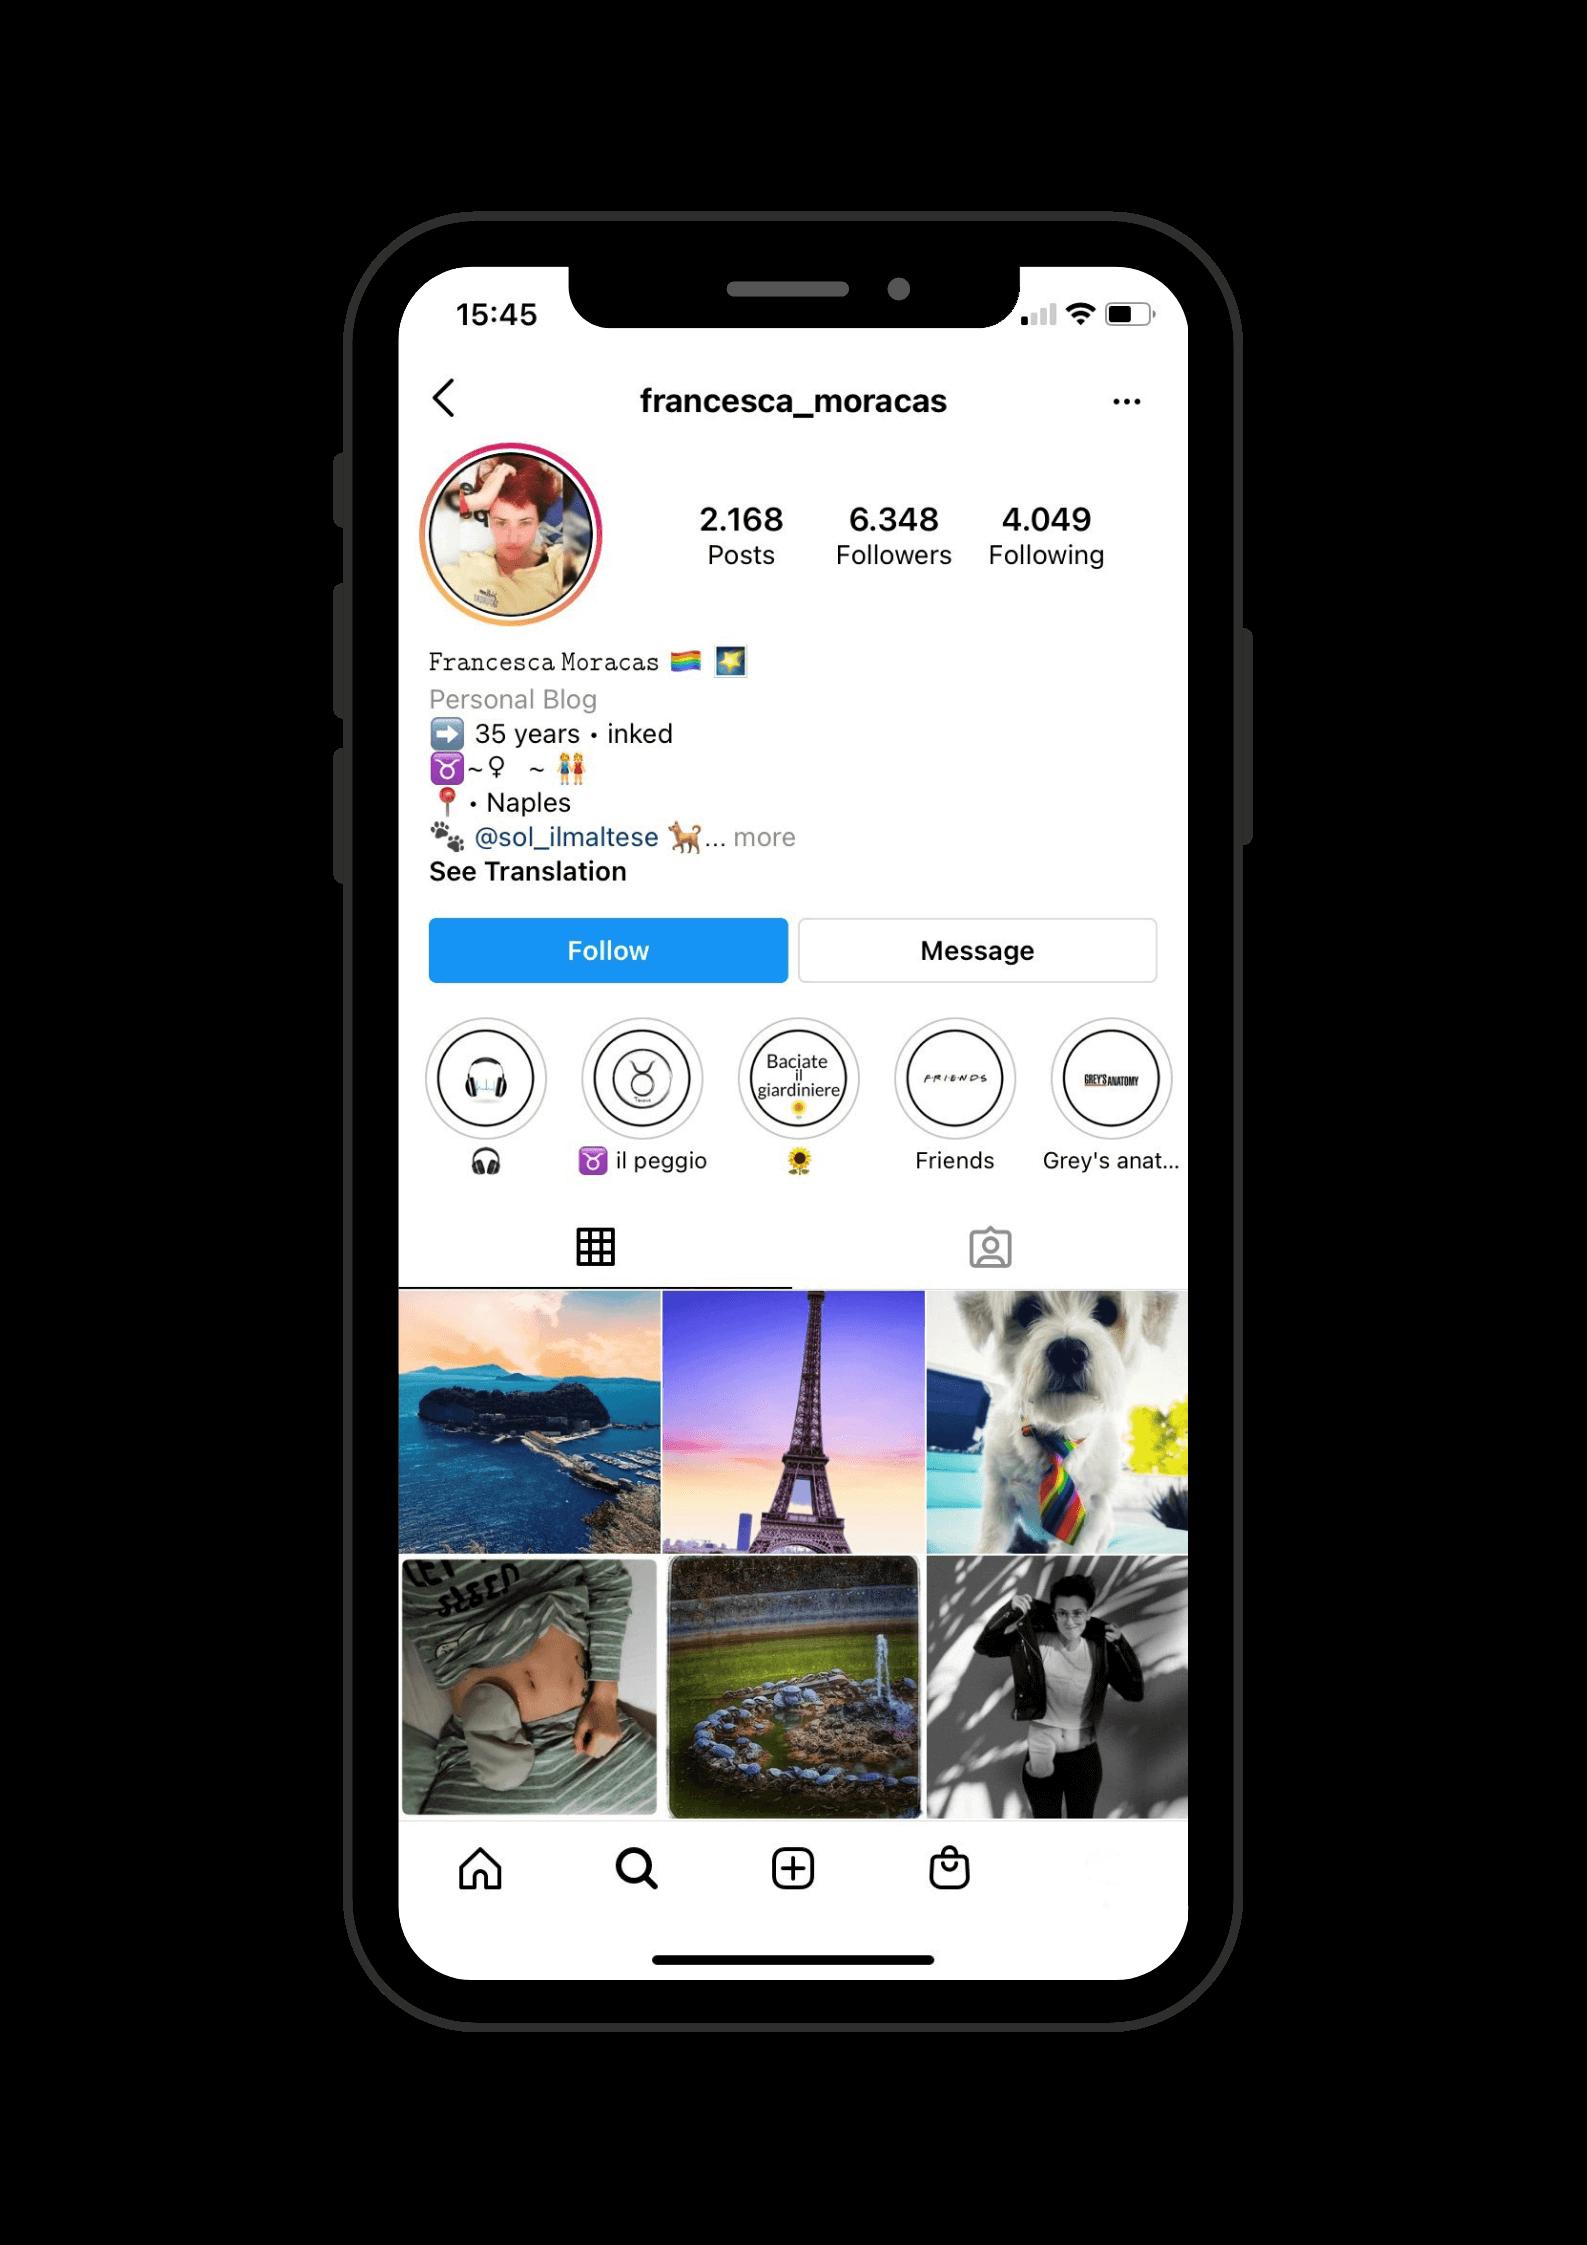 Francesca's Instagram profile